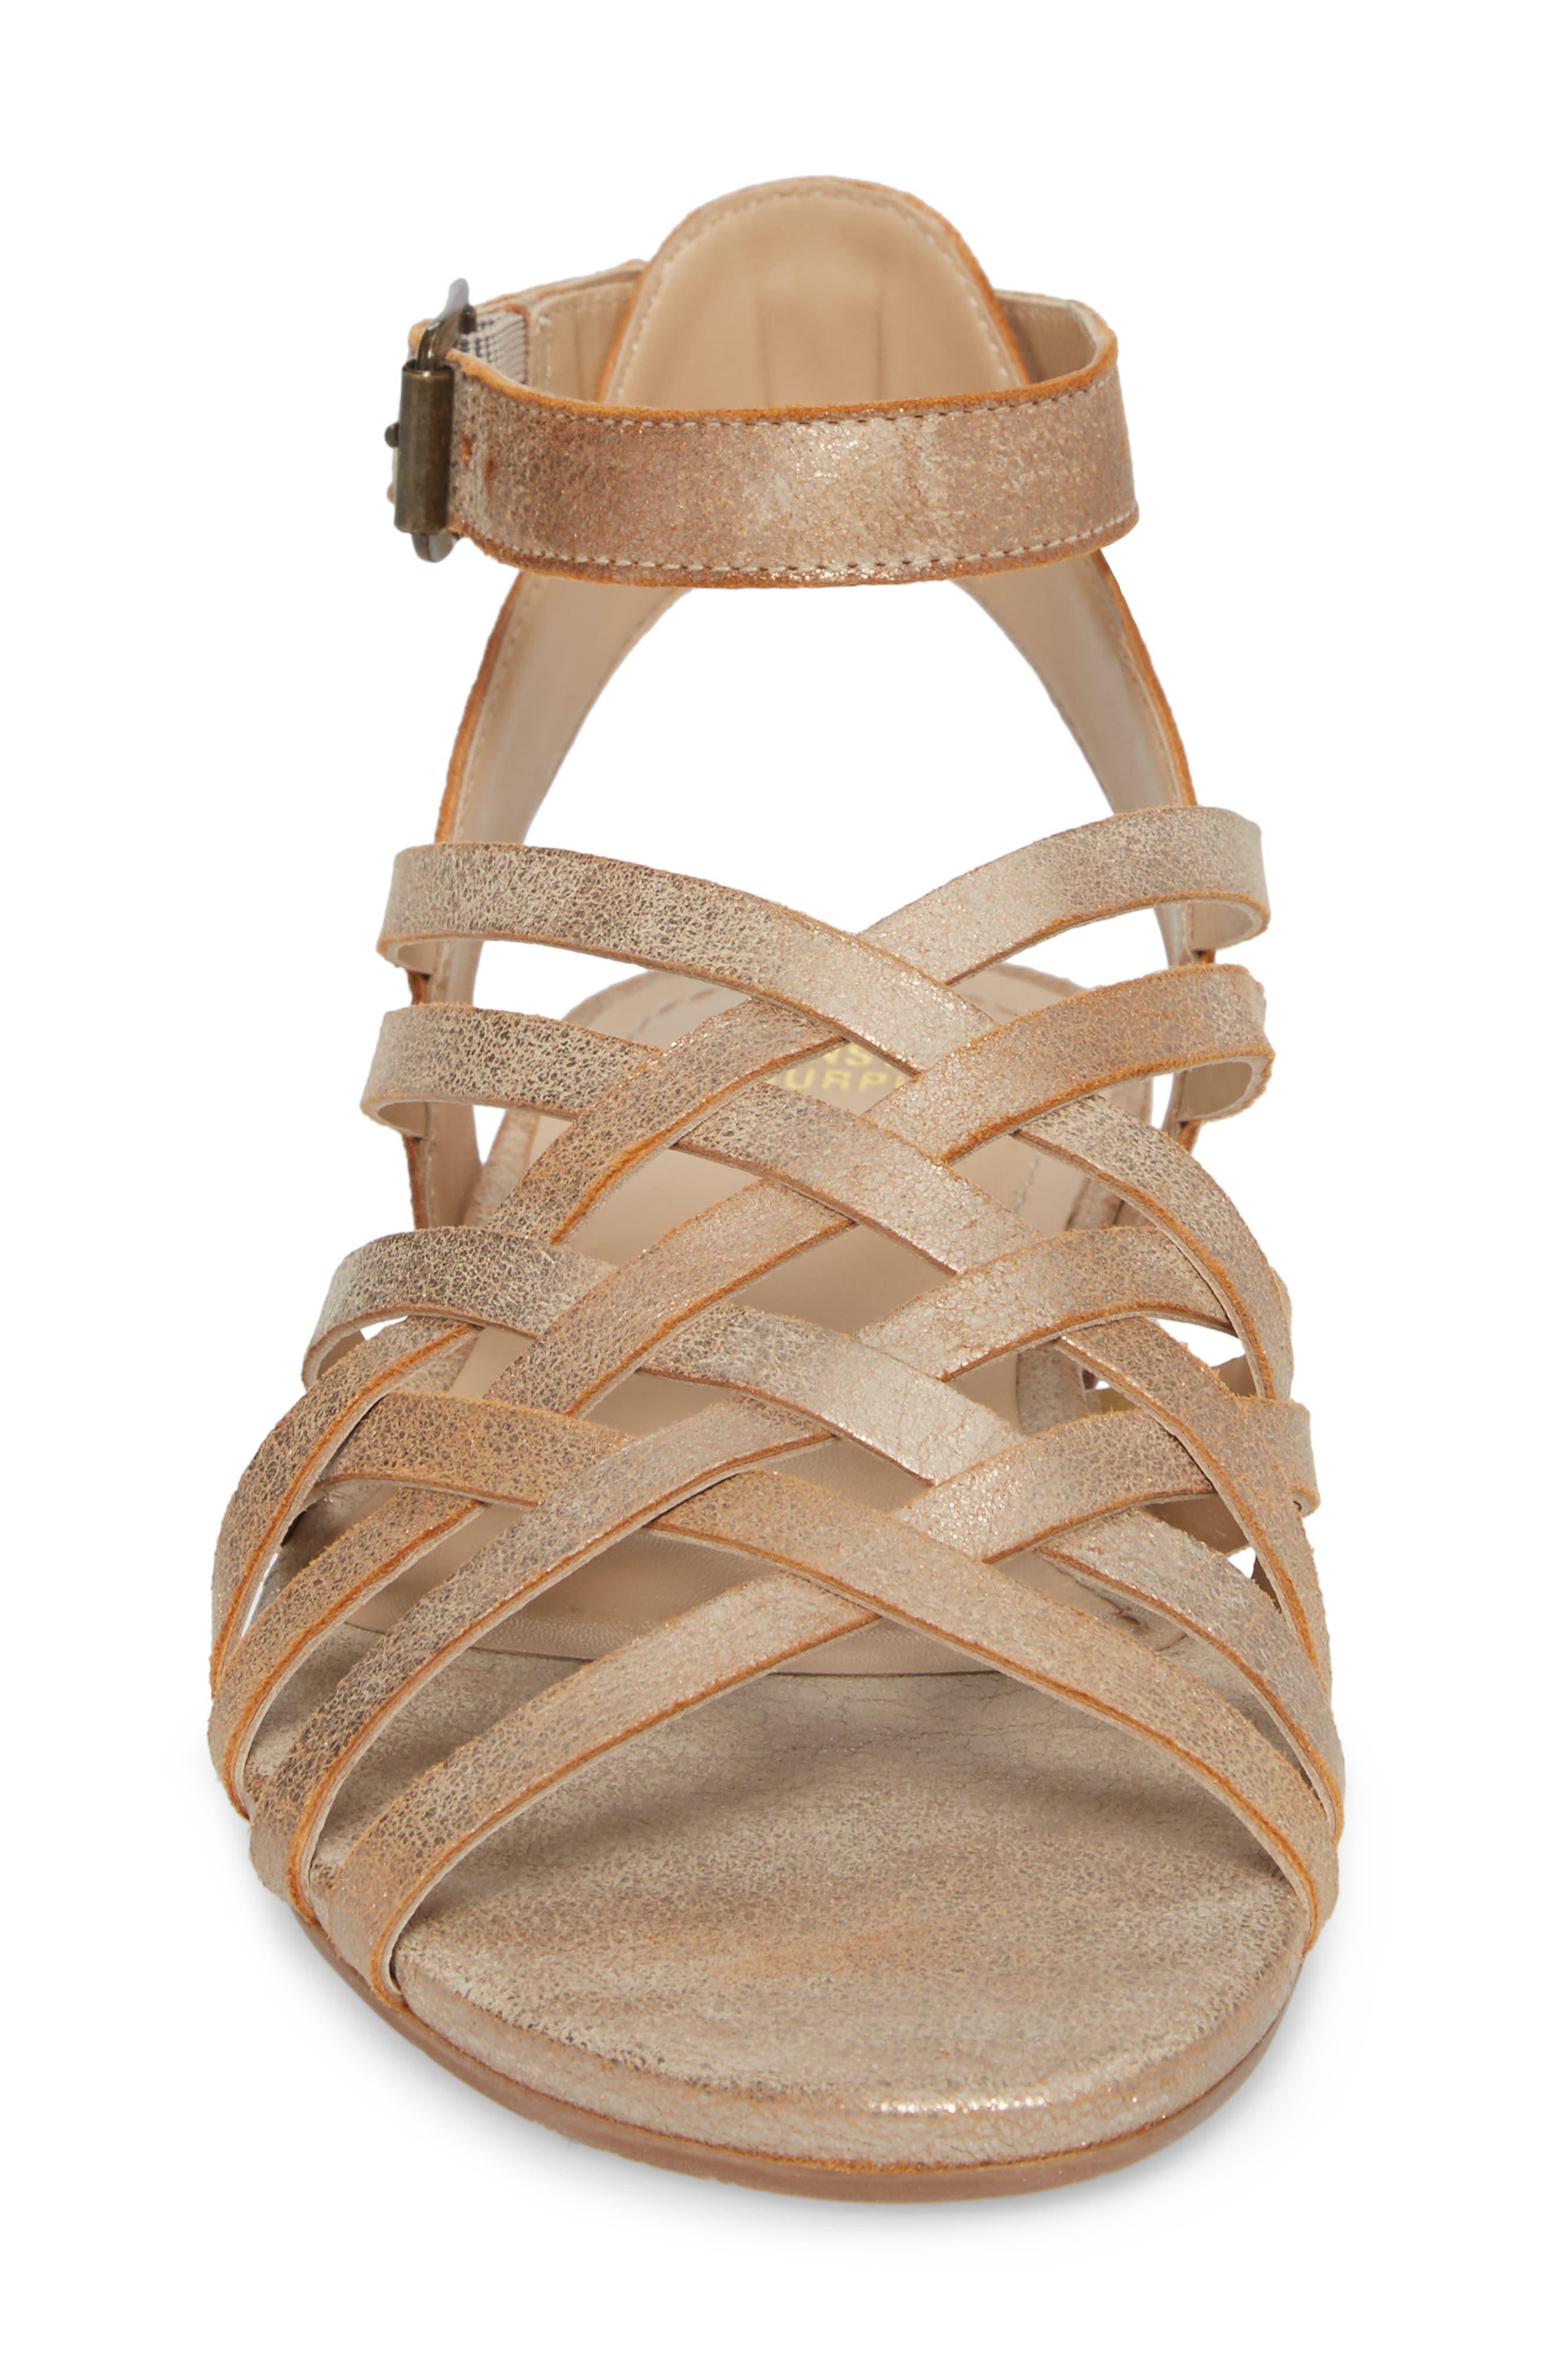 Hallie Sandal,                             Alternate thumbnail 4, color,                             Copper Leather